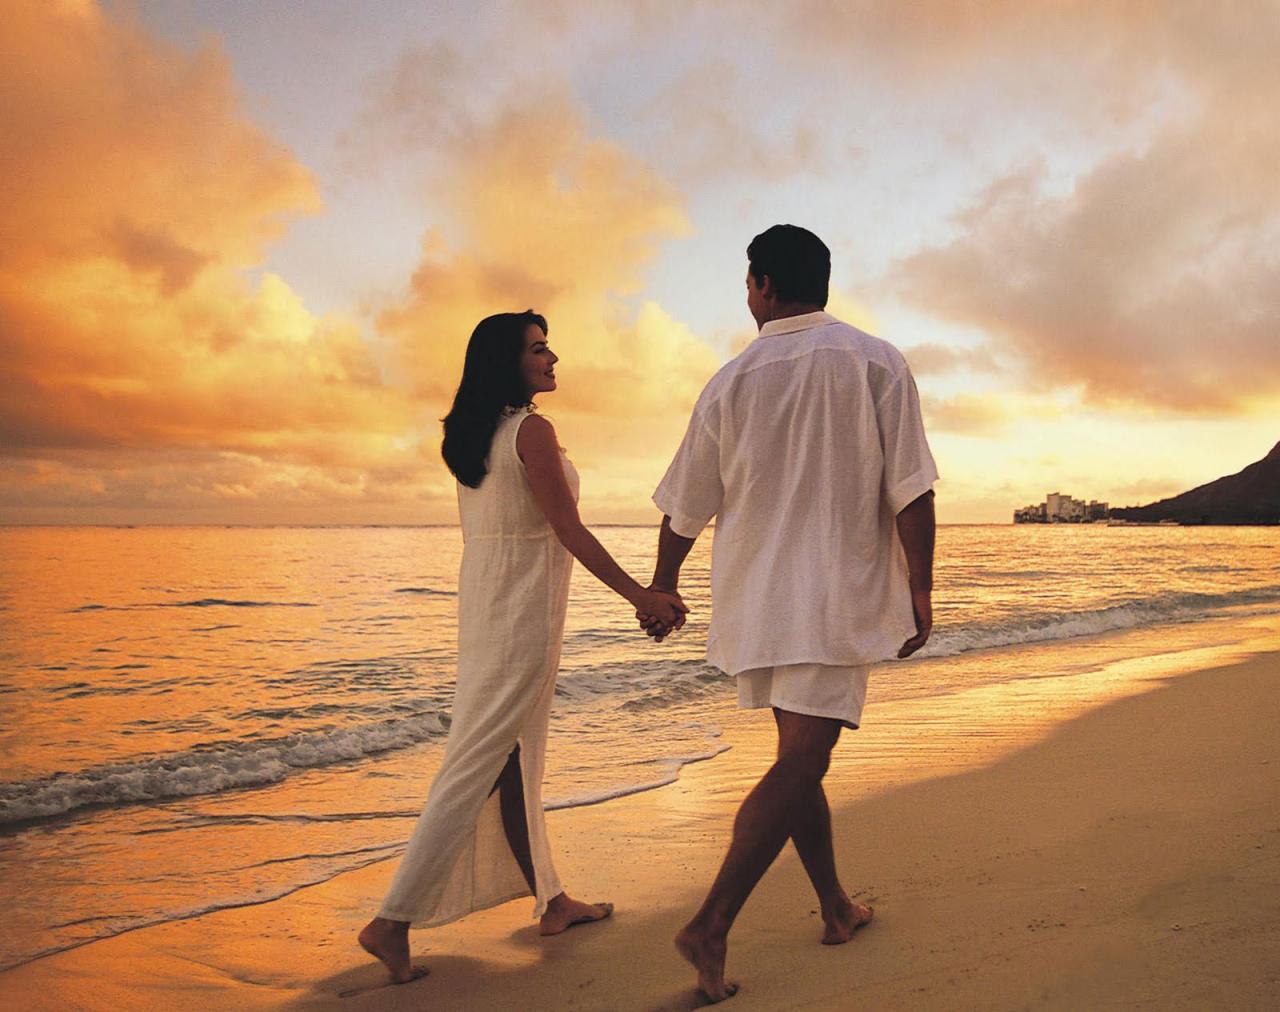 صور صور حب وغرام رومنسي , صور رومانسيه للانستجرام